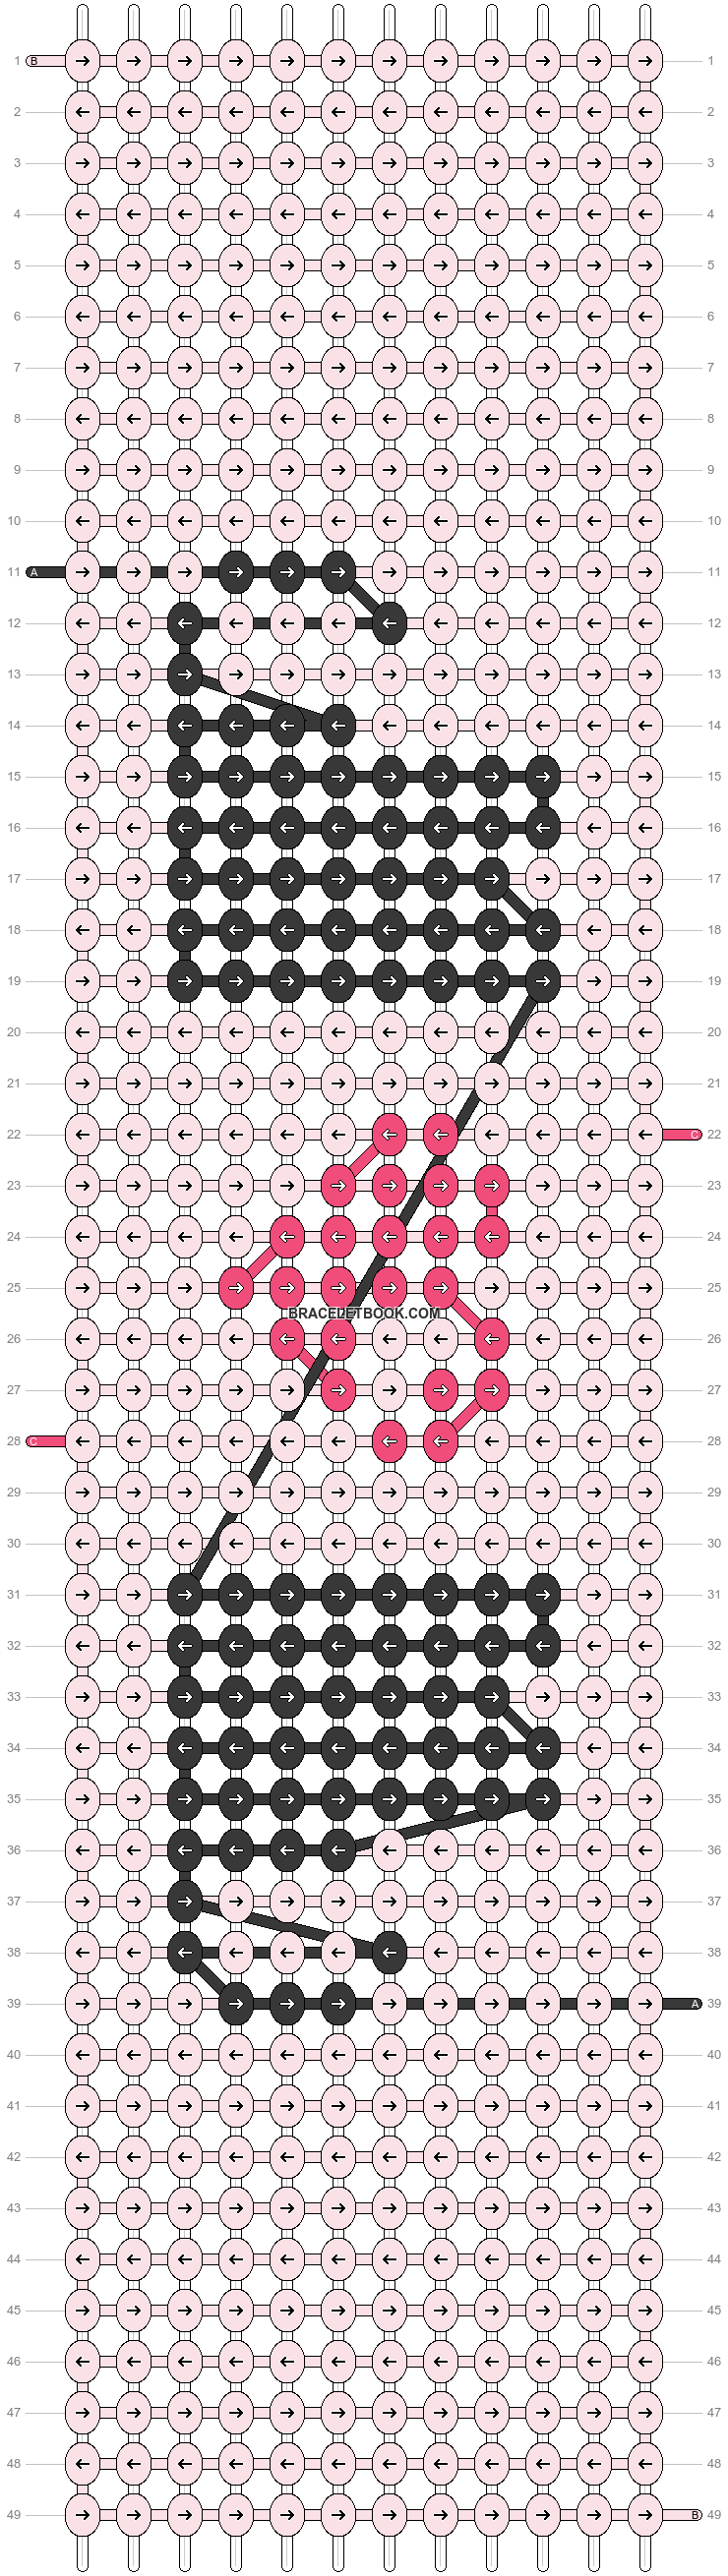 Alpha pattern #23582 pattern